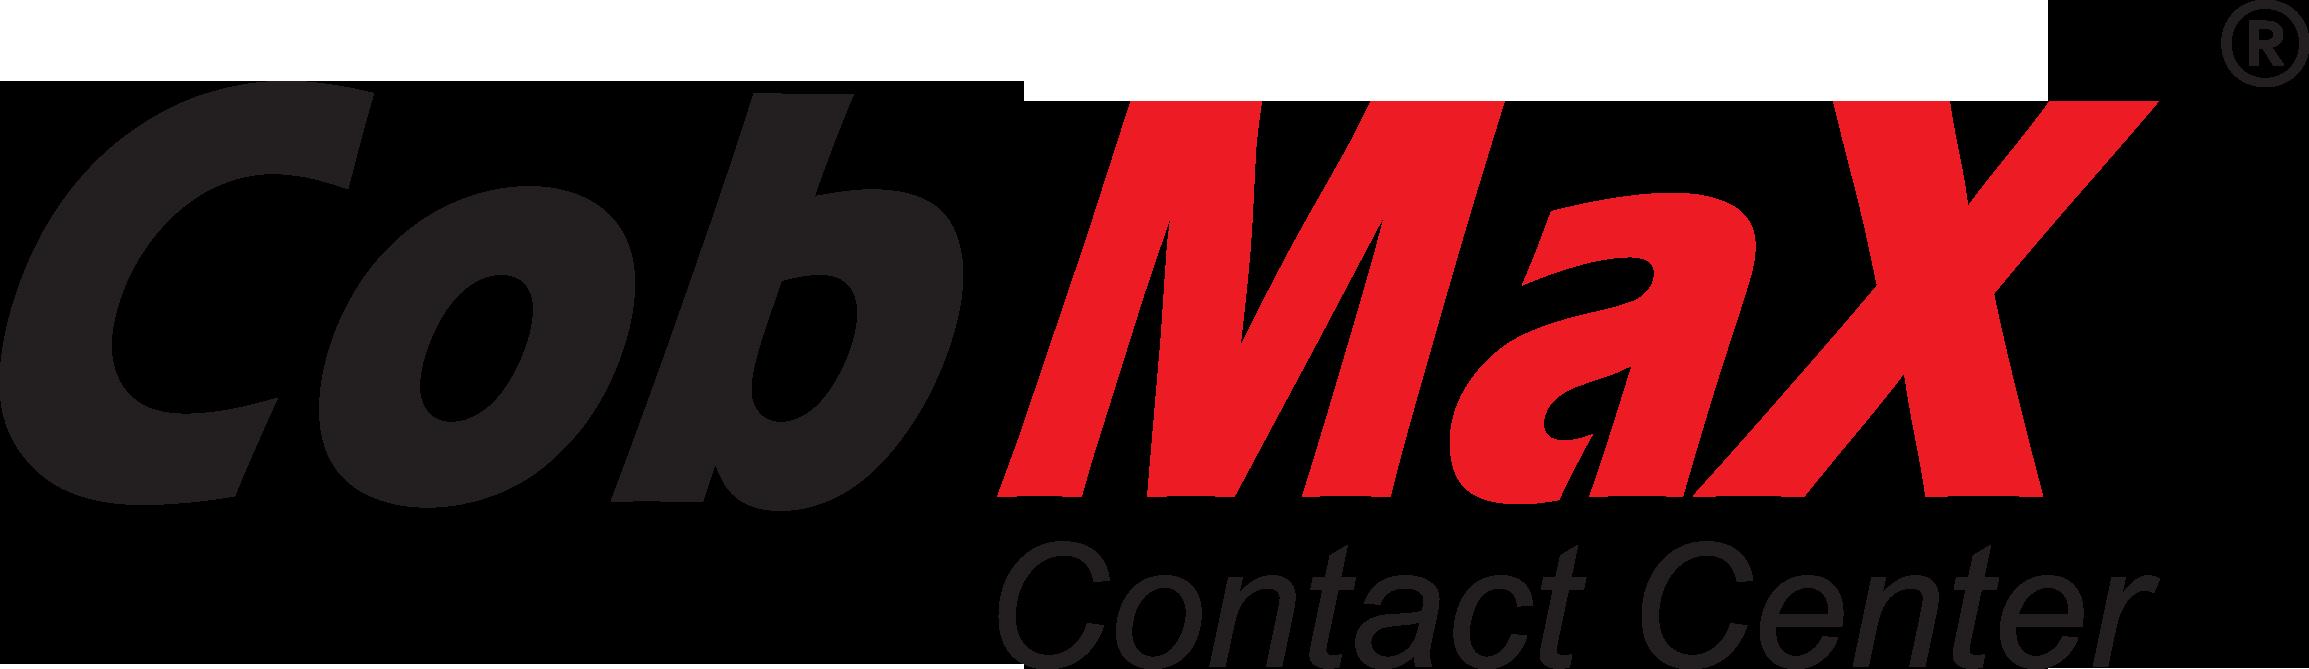 Logo Combax